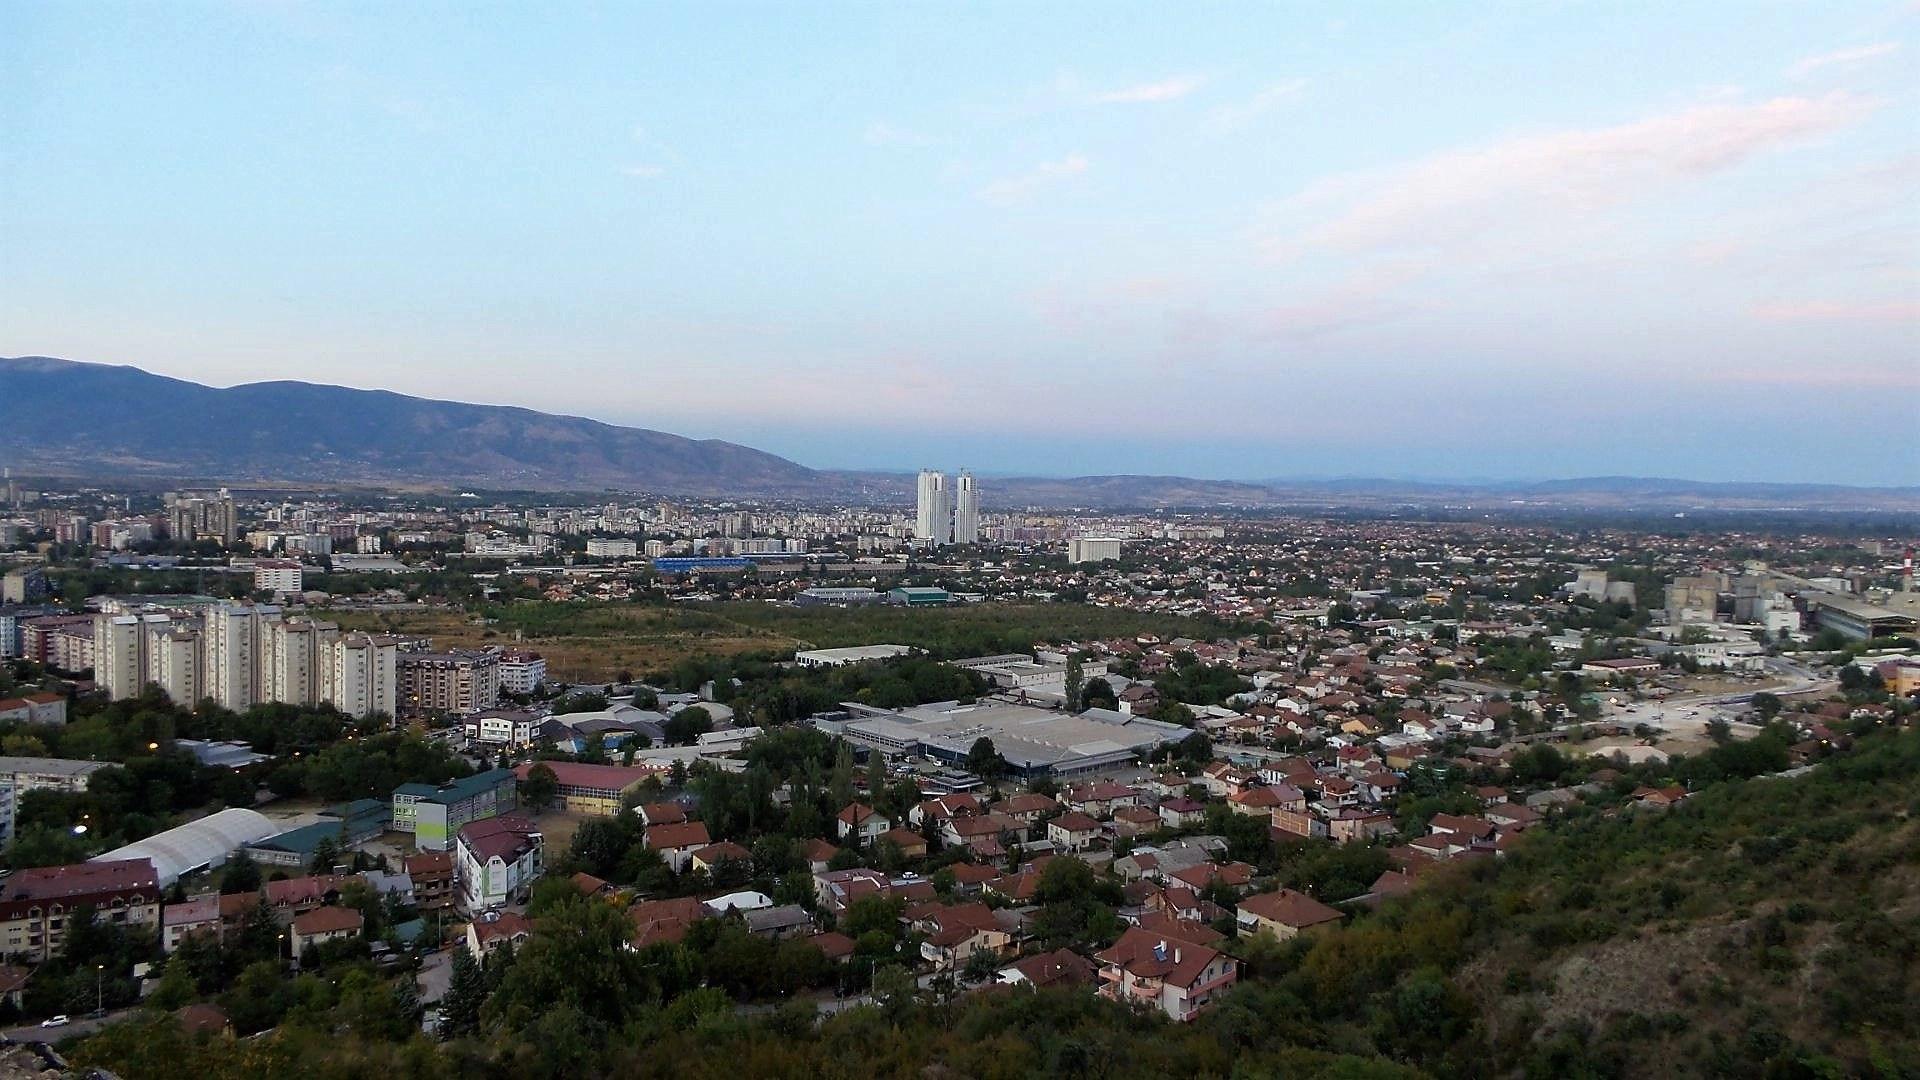 Overlooking Skopje from Vodno